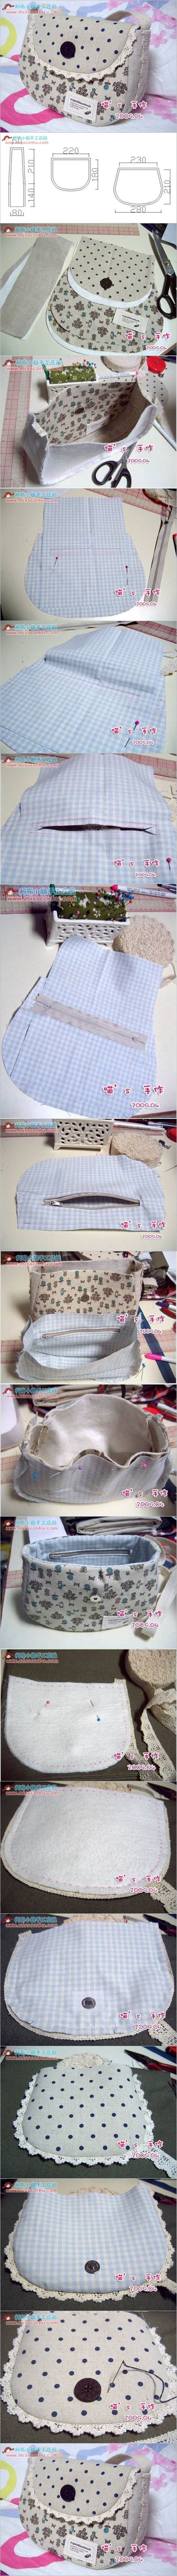 How to Sew a Simple Summer Handbag #craft #sewing #handbag